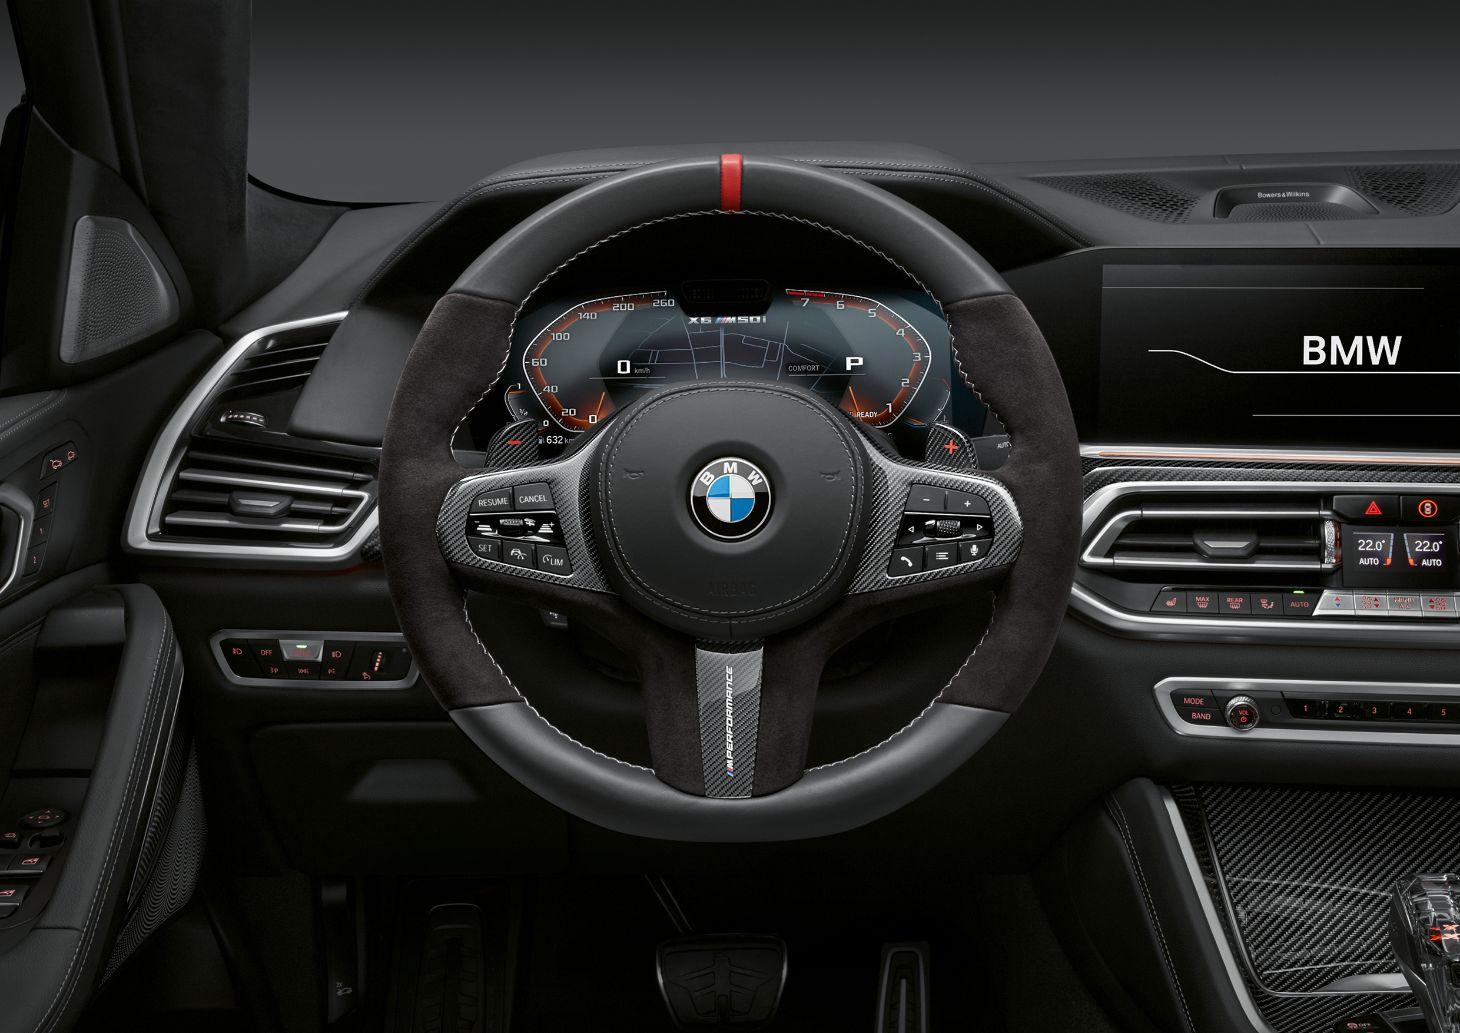 volante do bmw x6 m performance